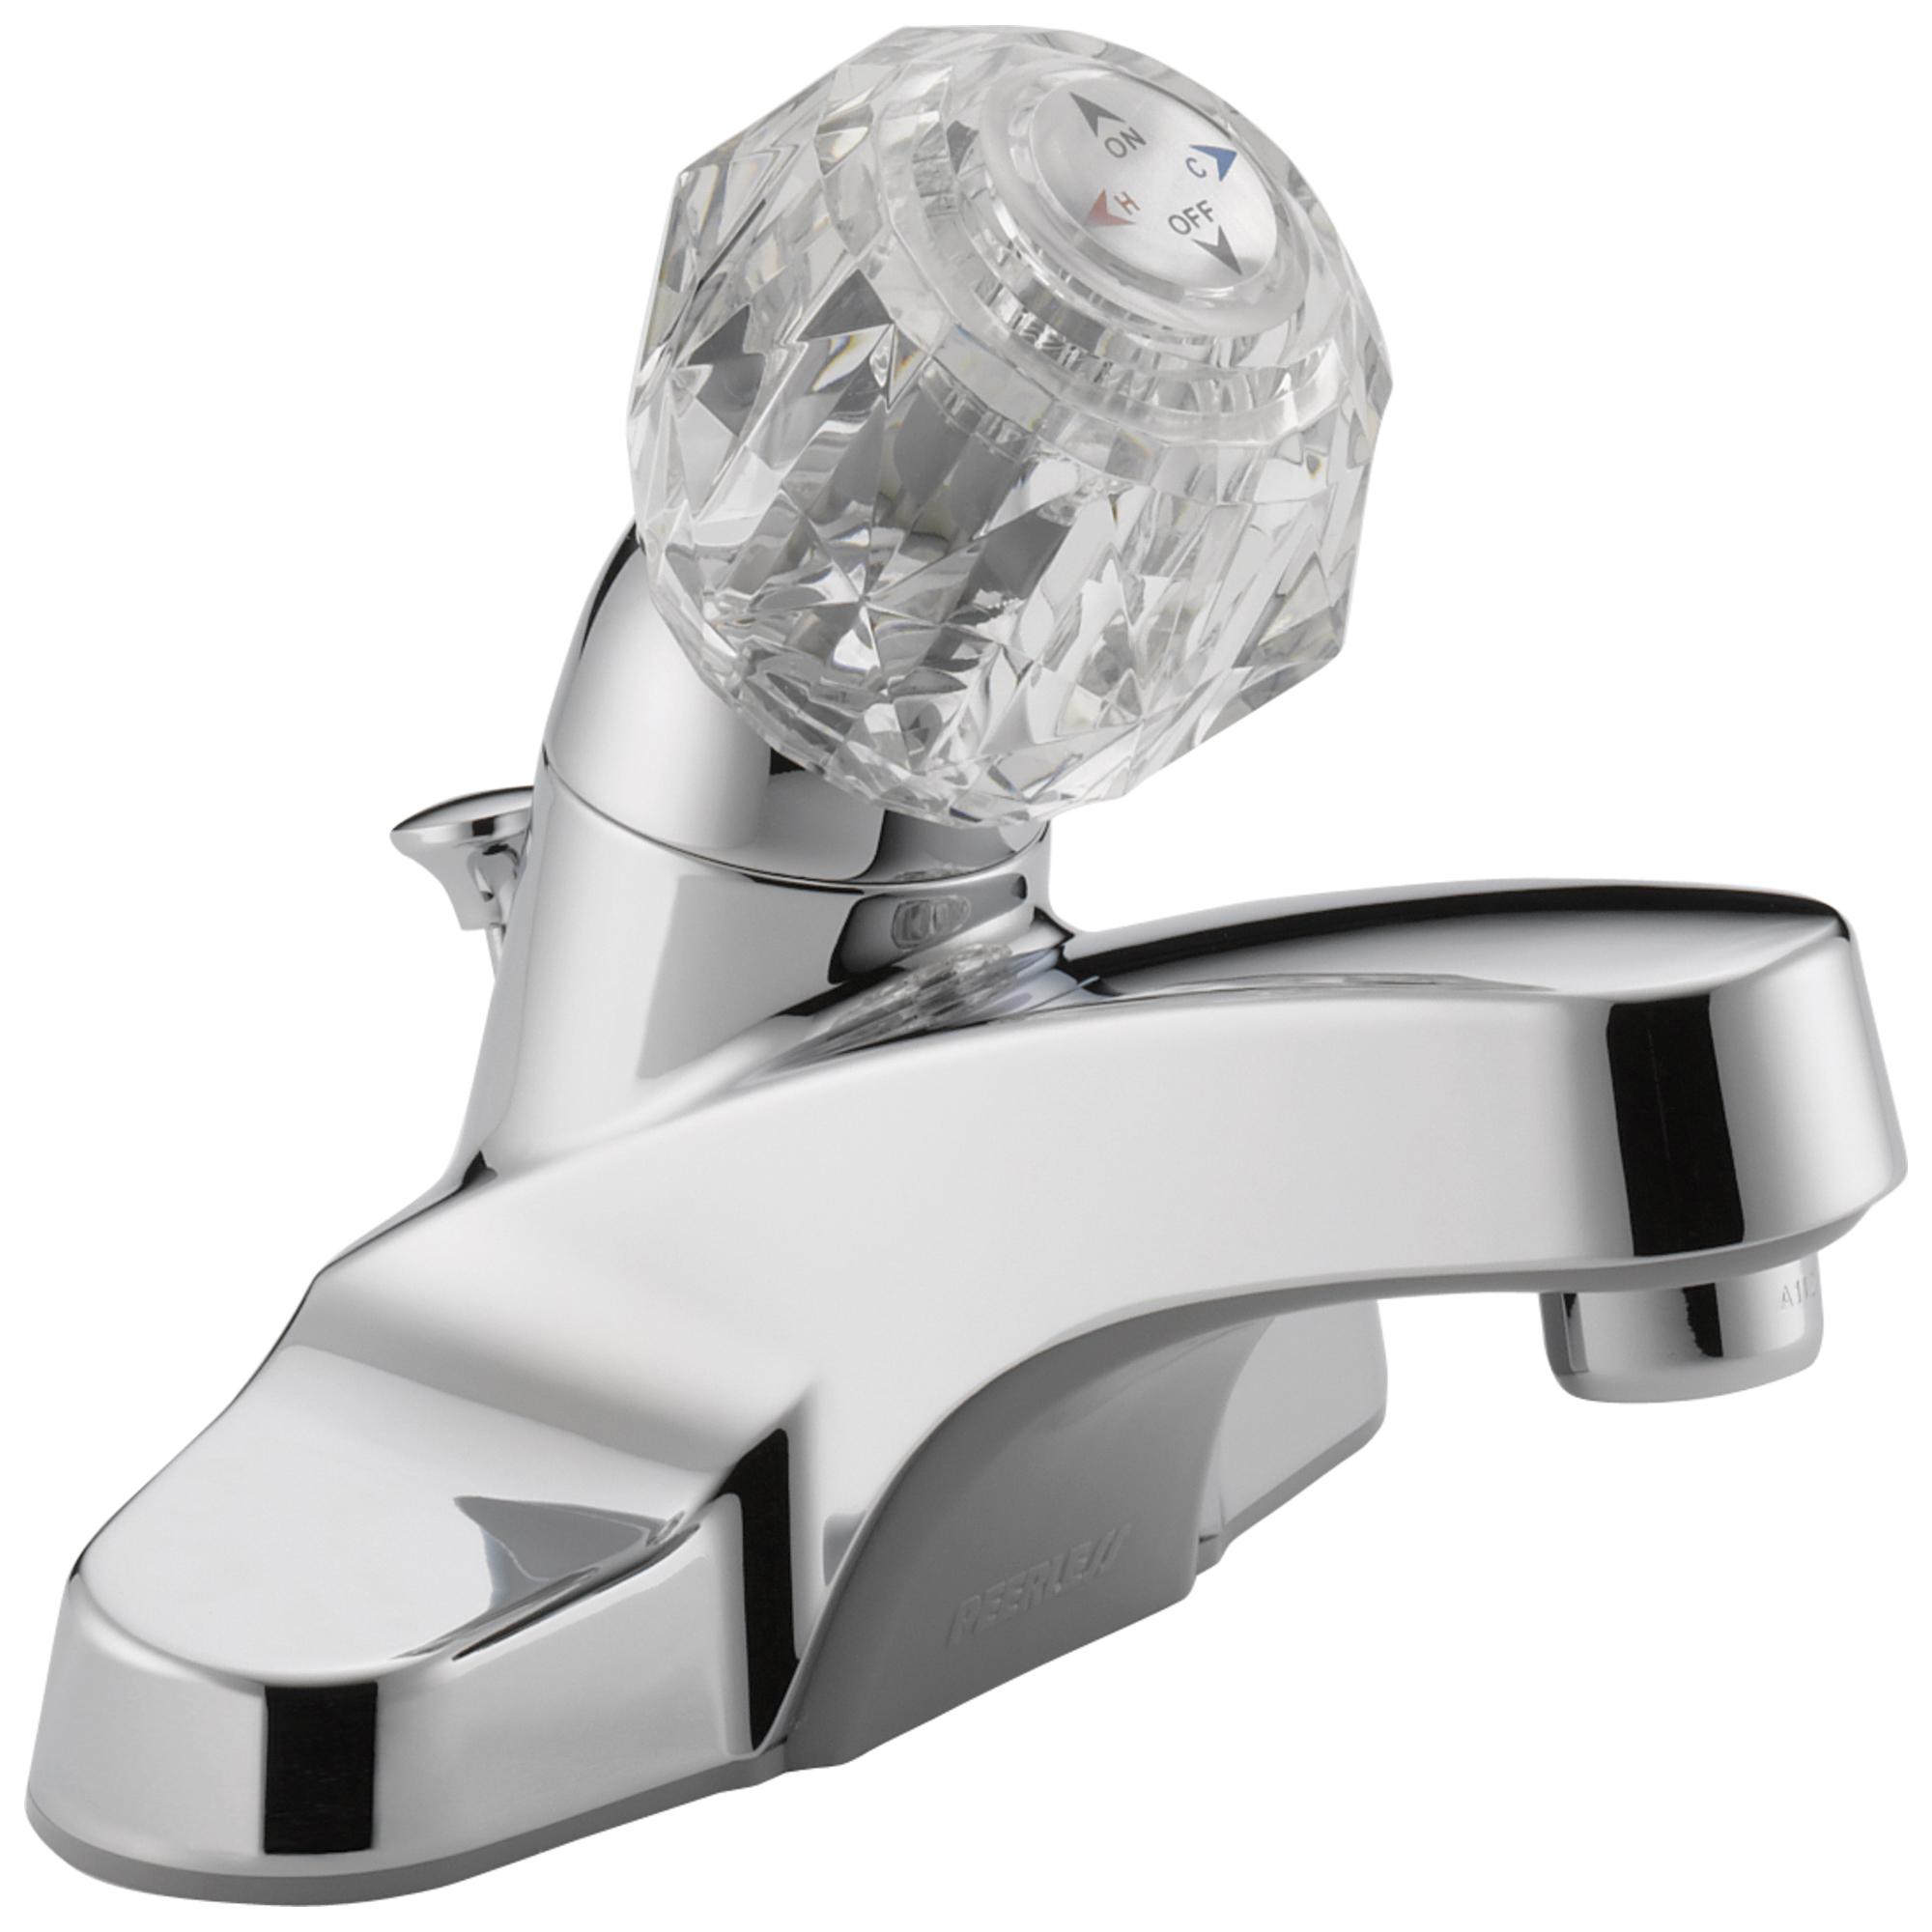 Peerless® P135LF Centerset Lavatory Faucet, Chrome Plated, 1 Handles, Plastic Pop-Up Drain, 1.2 gpm